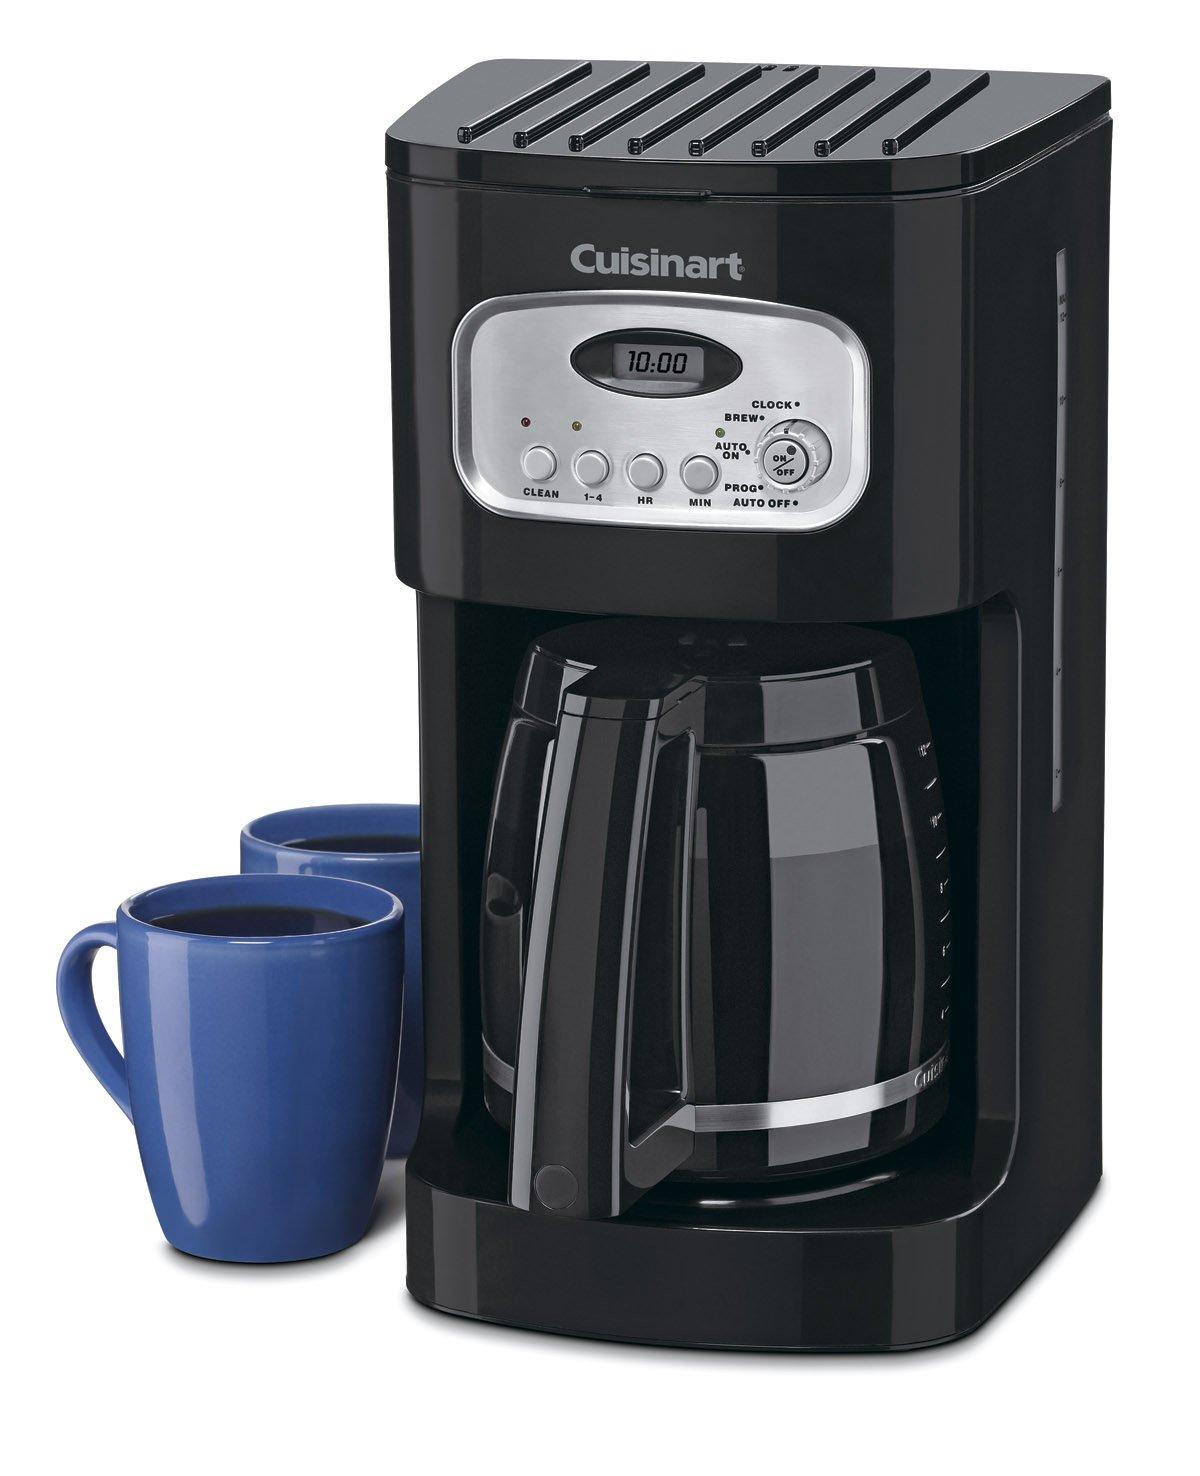 Cuisinart DCC-1100BK 12-Cup Programmable Coffeemaker, Black